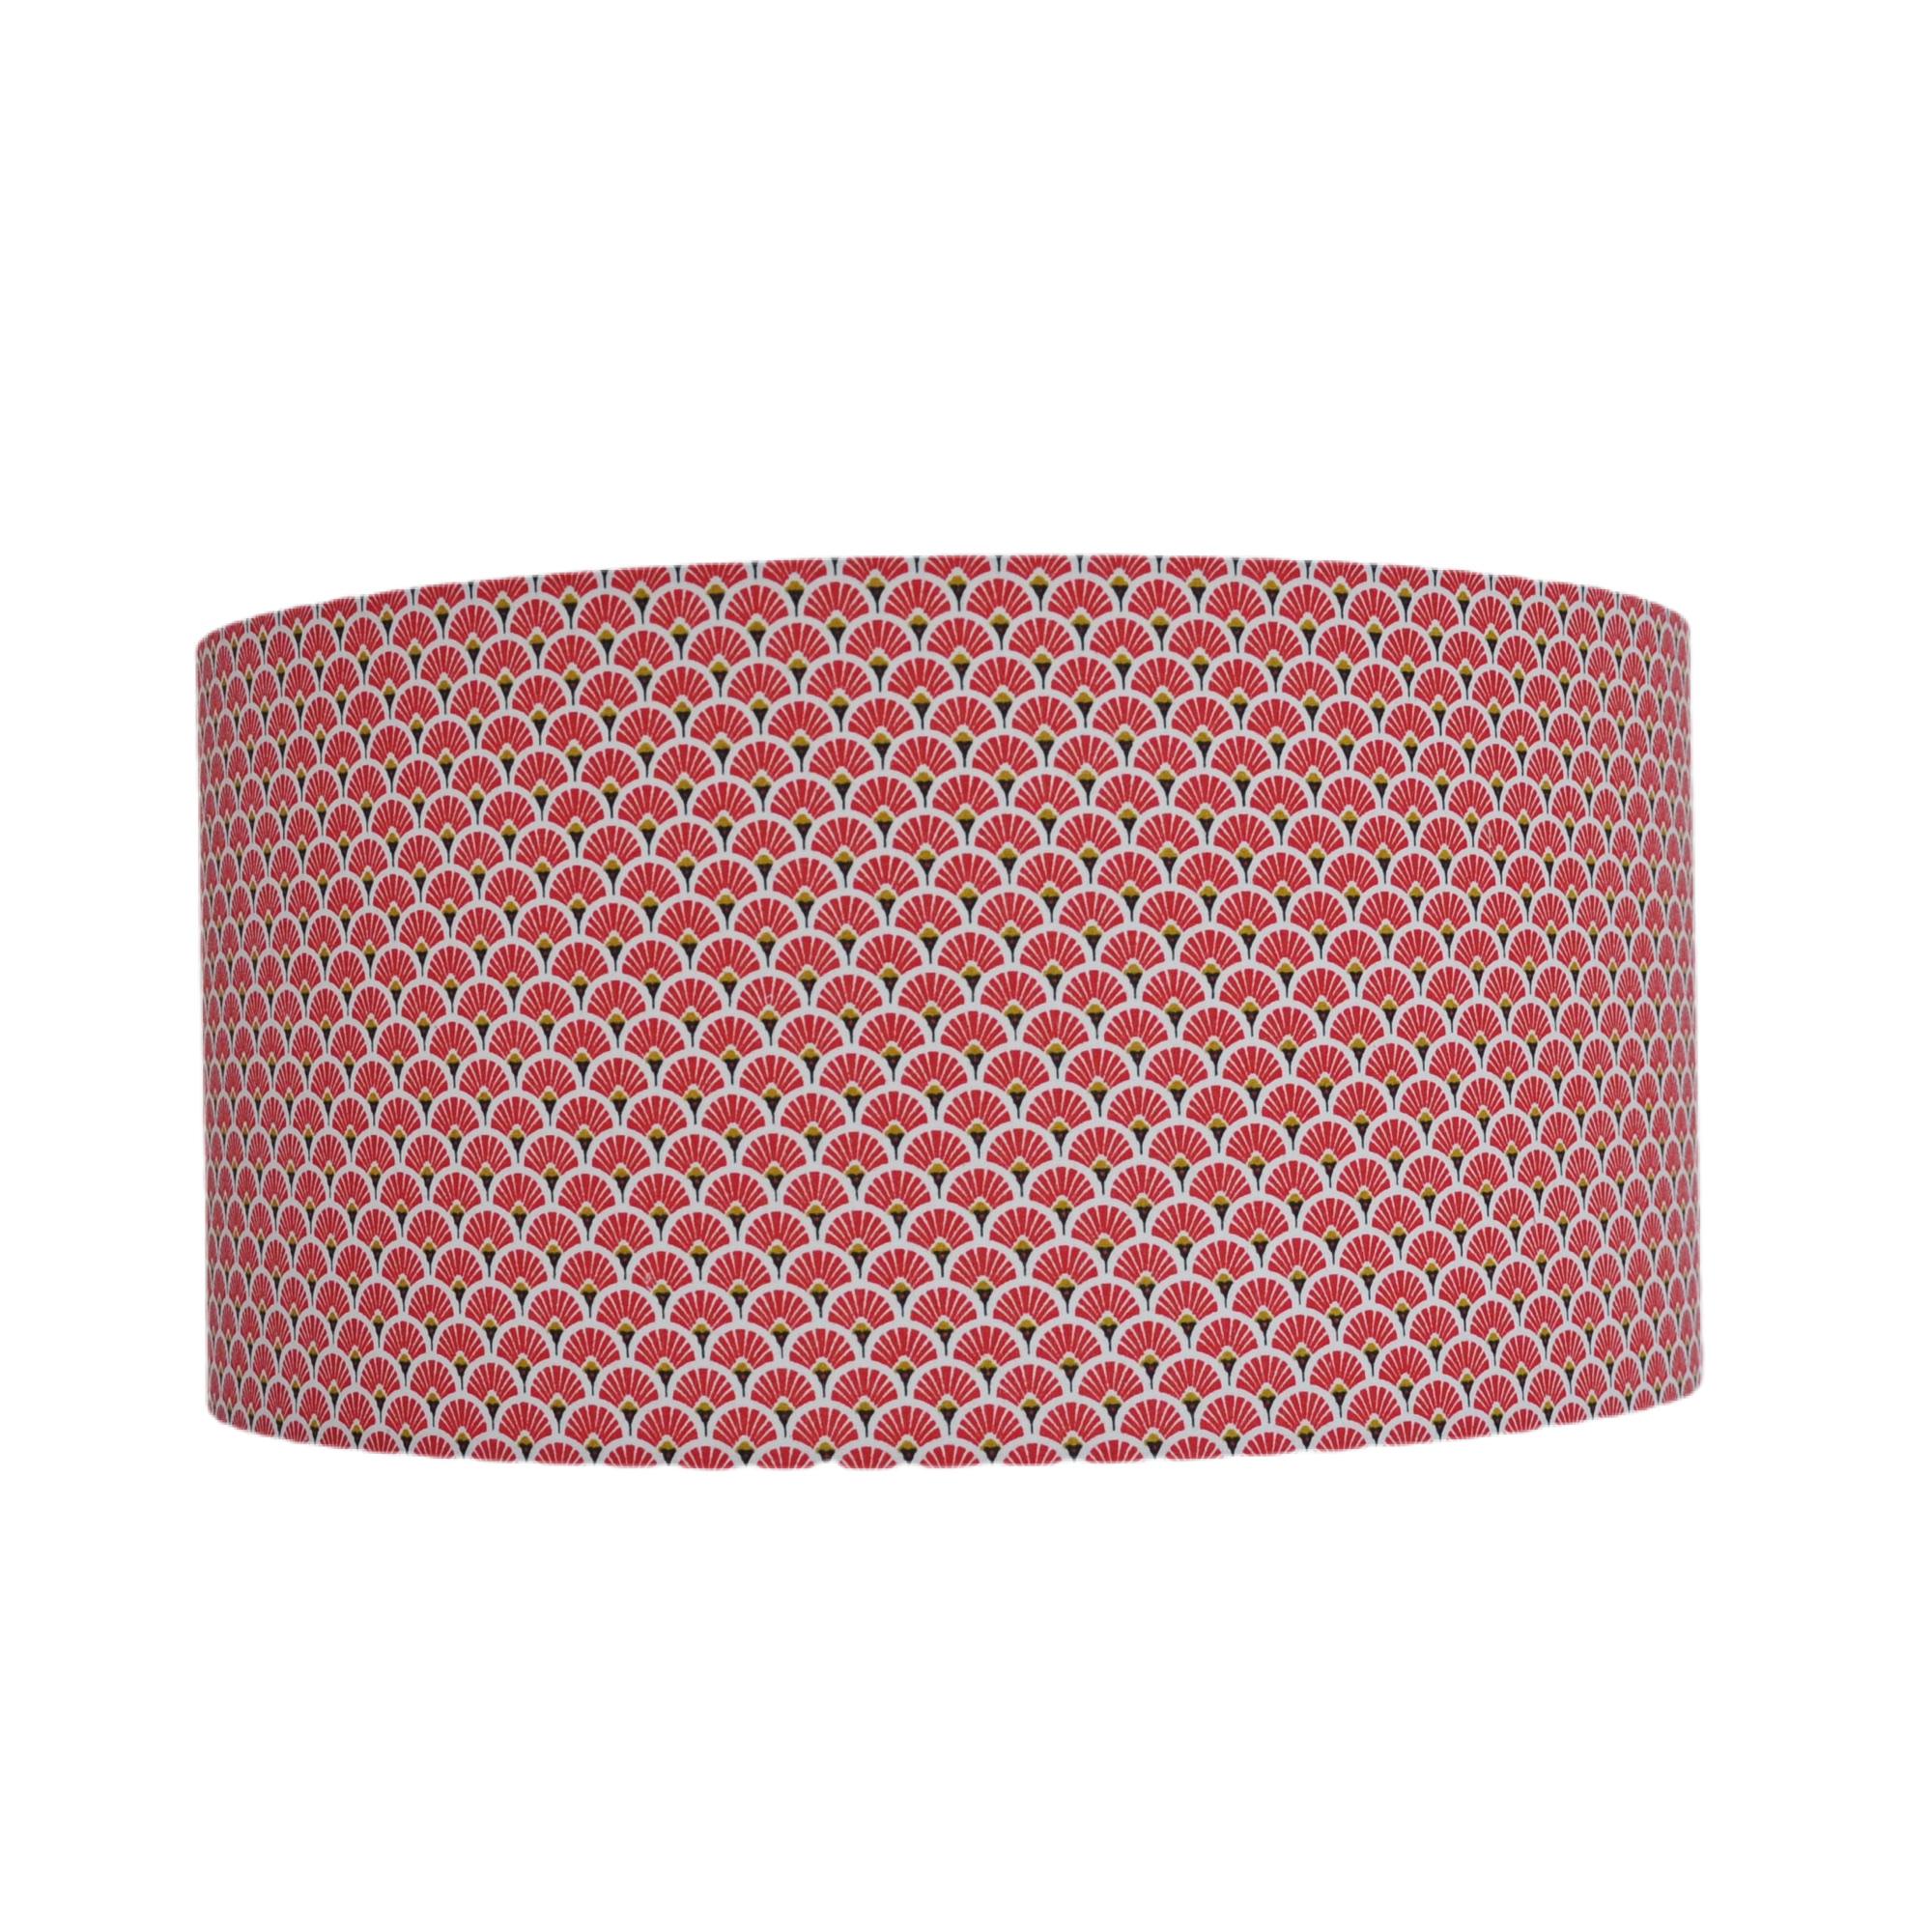 Suspension eventail rouge et or diamètre 20 cm